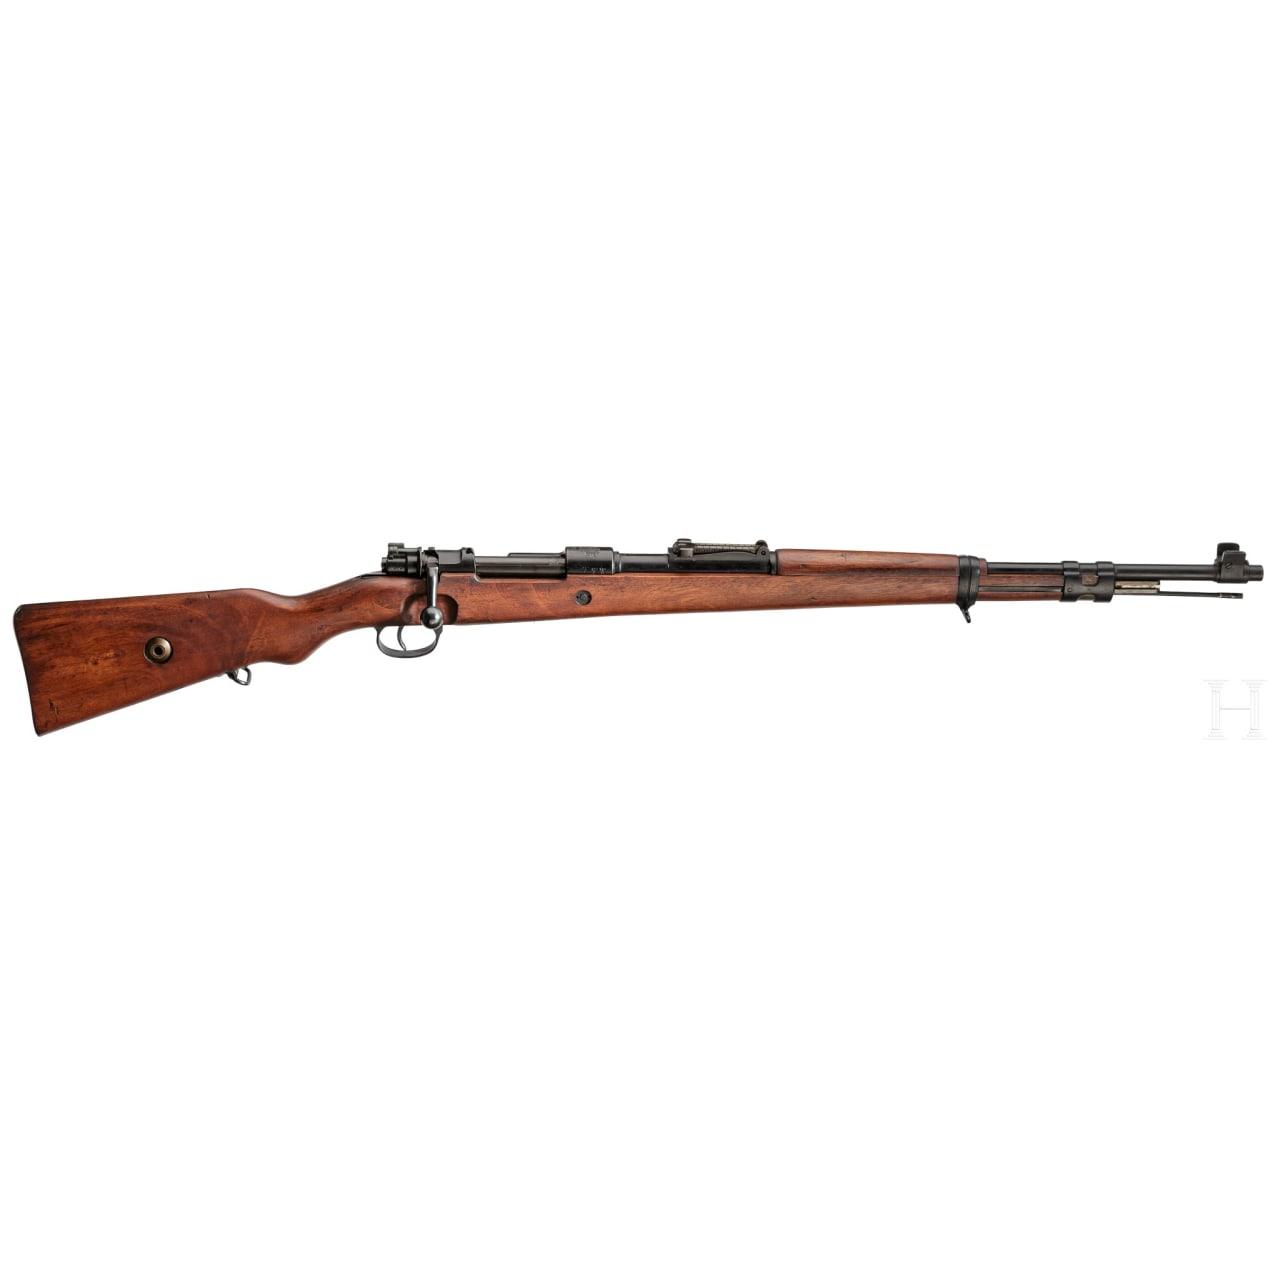 Karabiner 98 k M 1937, Mauser